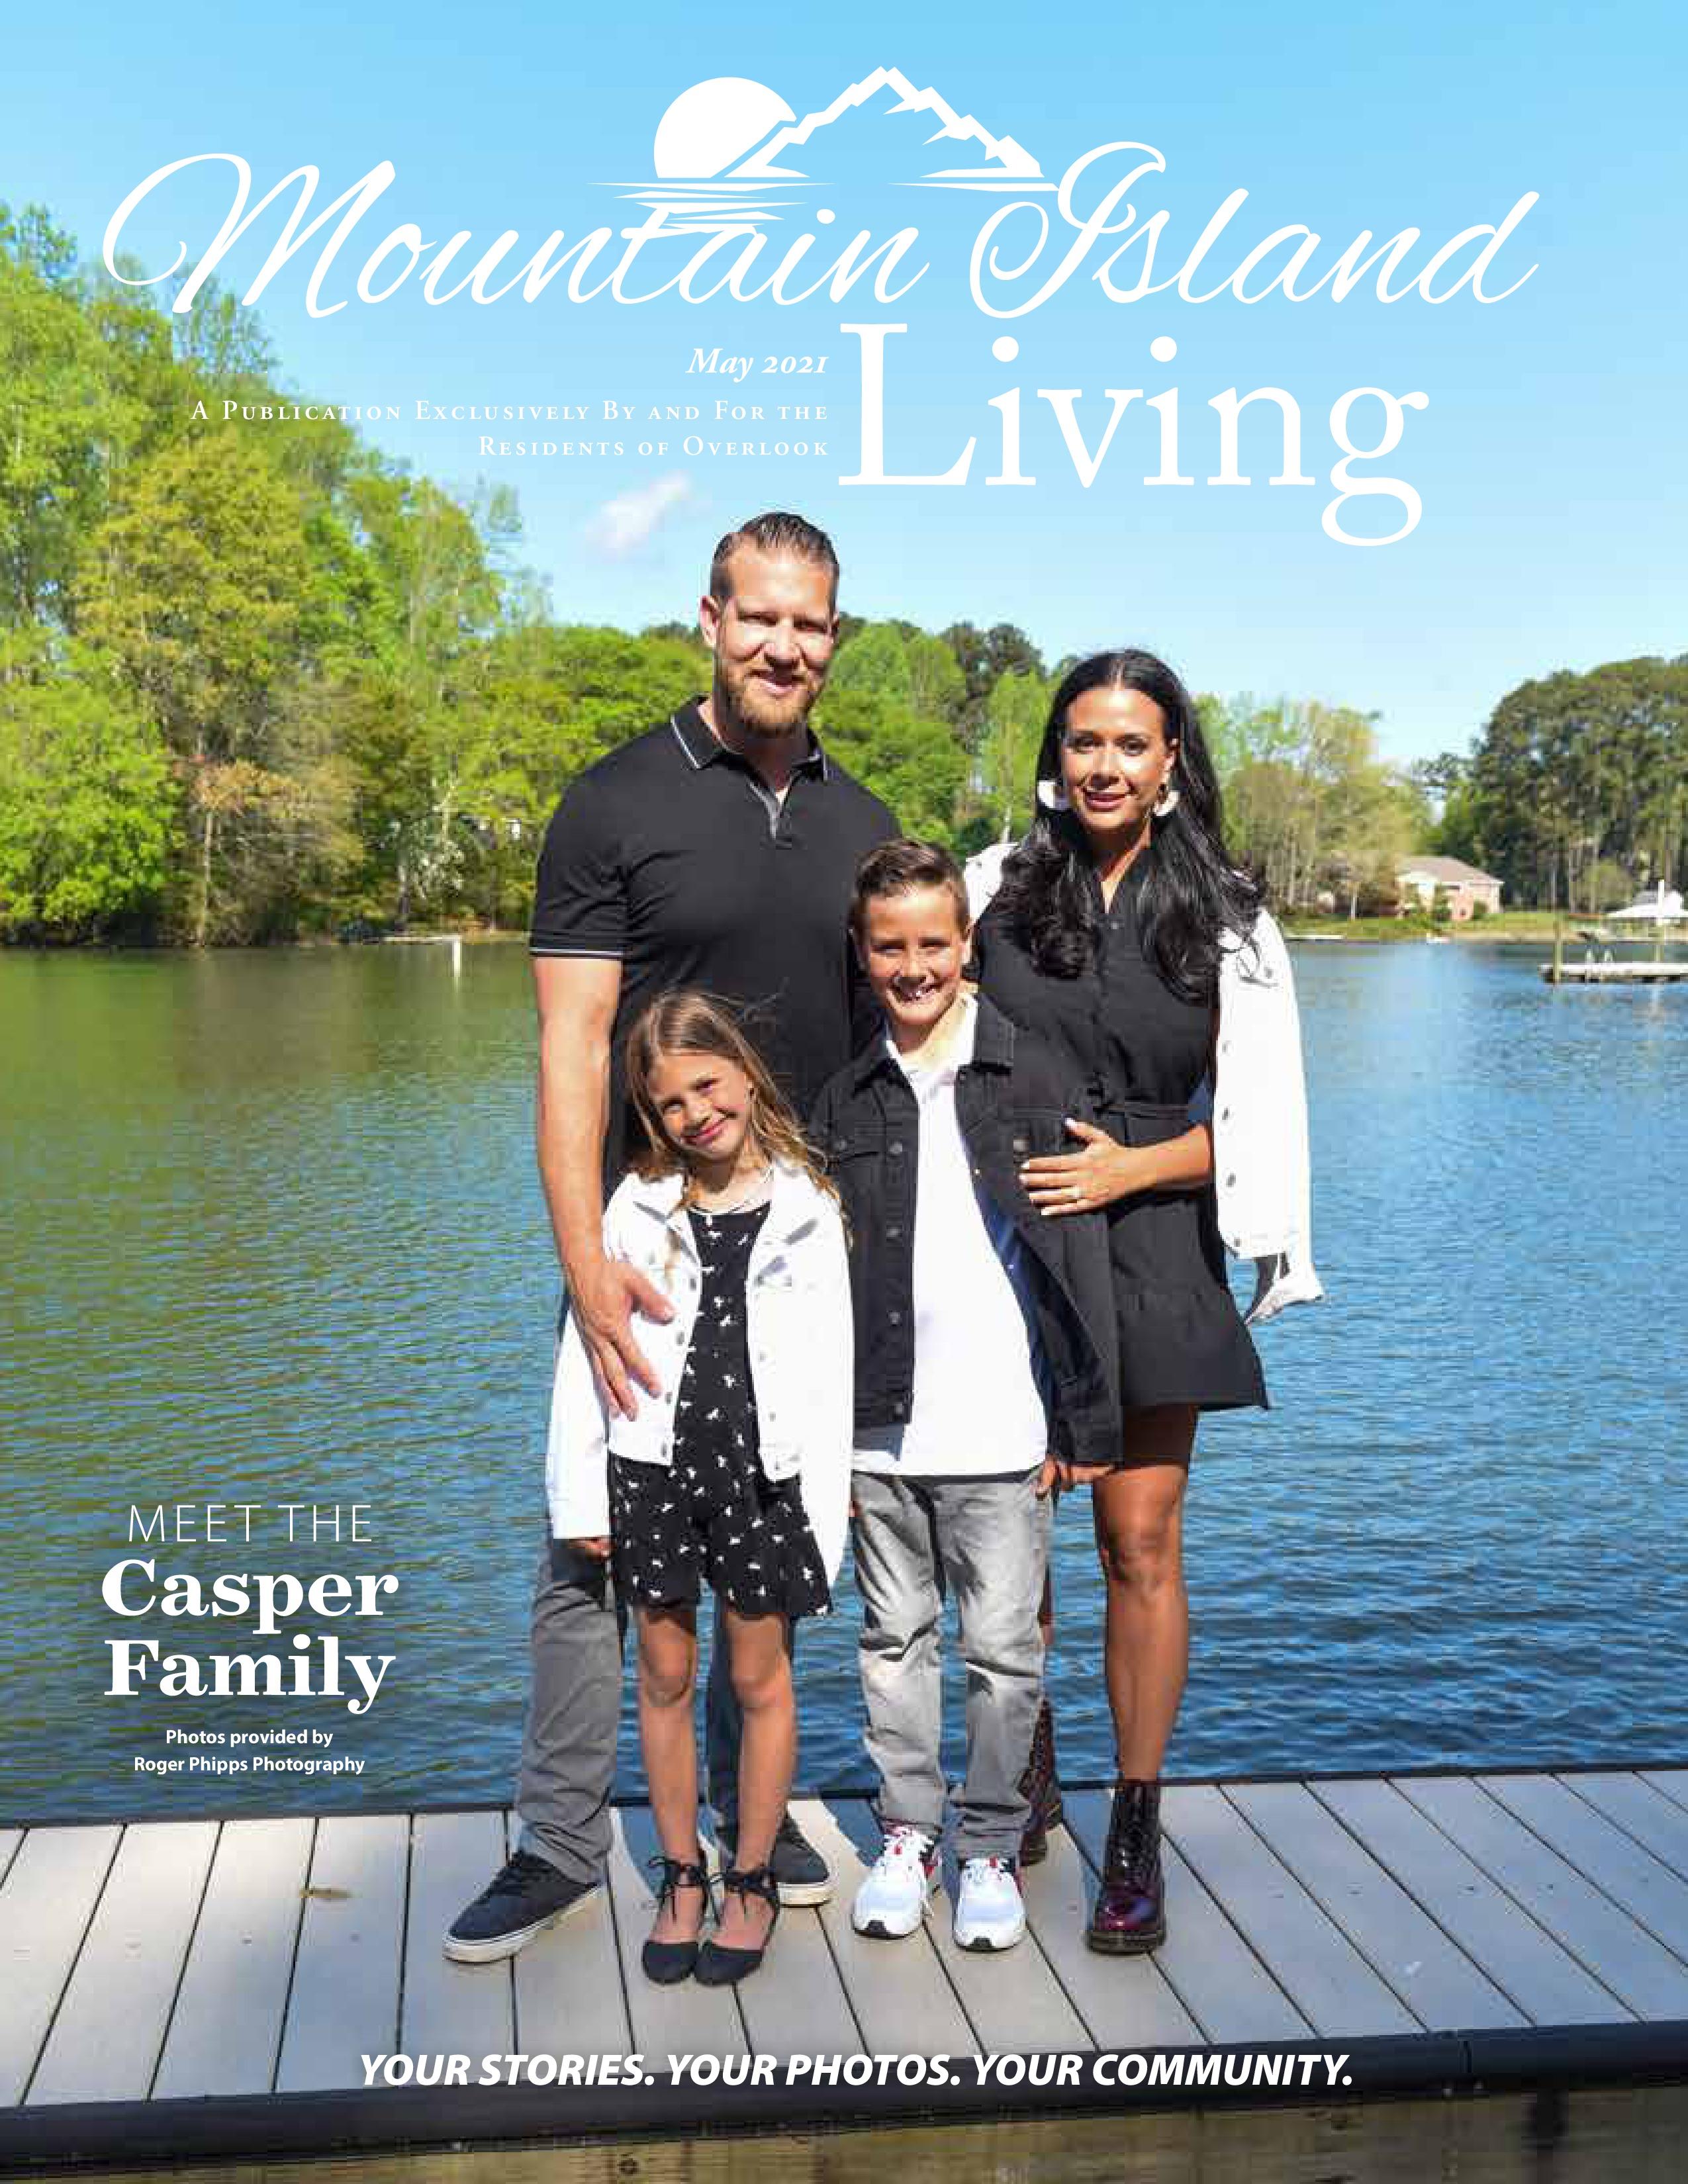 Mountain Island Living 2021-05-01